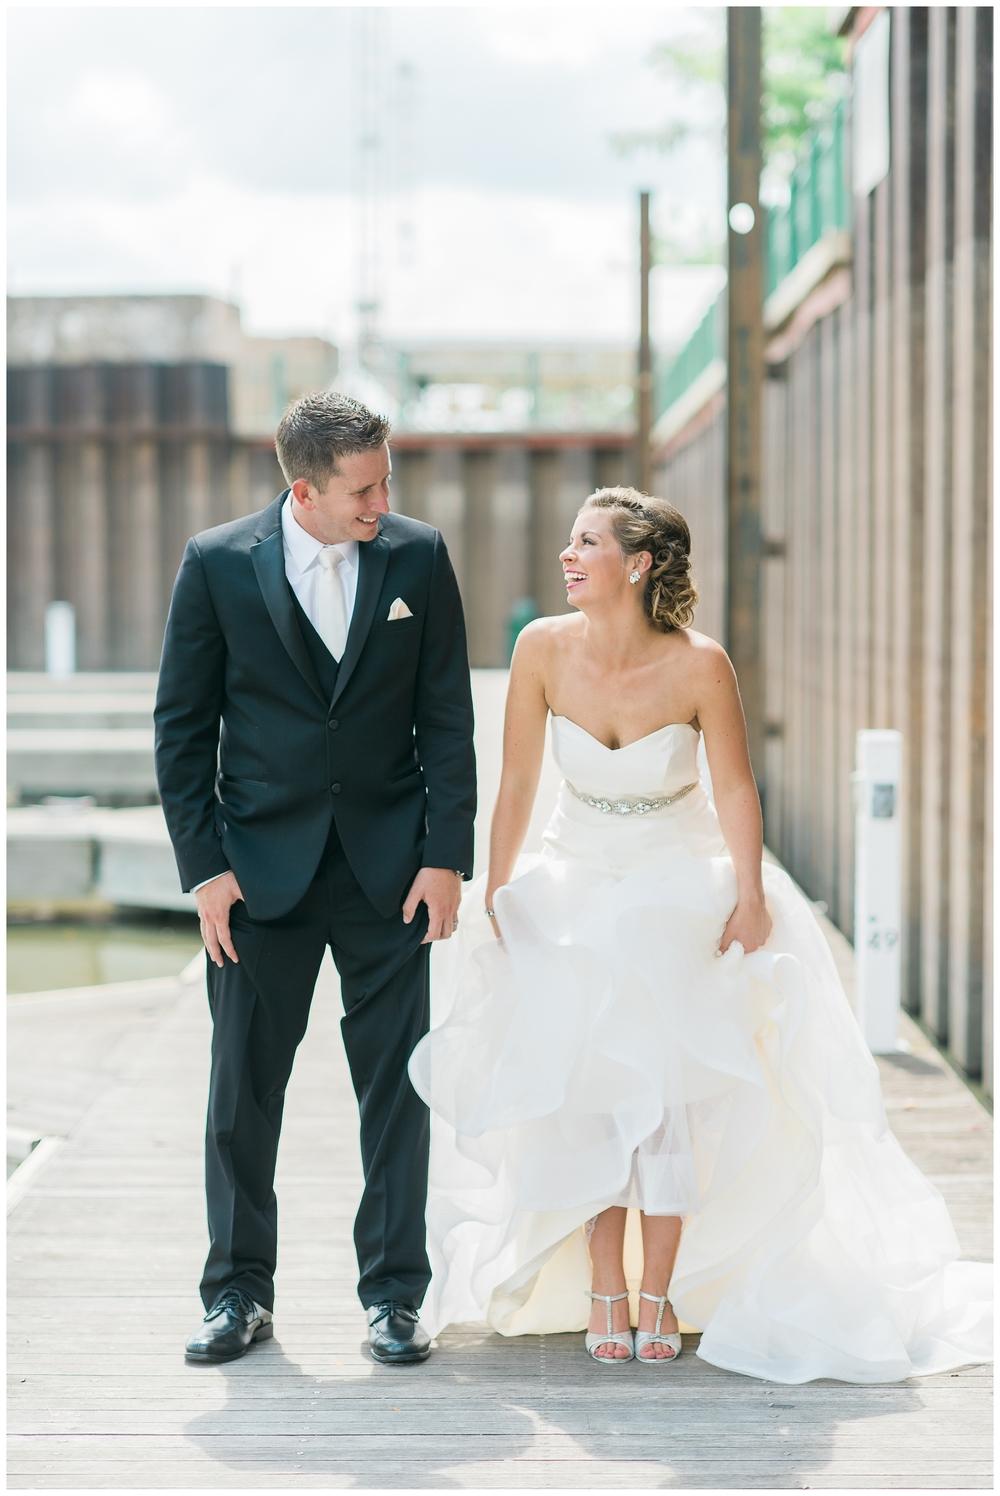 Rebecca_Bridges_Photography_Indianapolis_Wedding_Photographer_5047.jpg